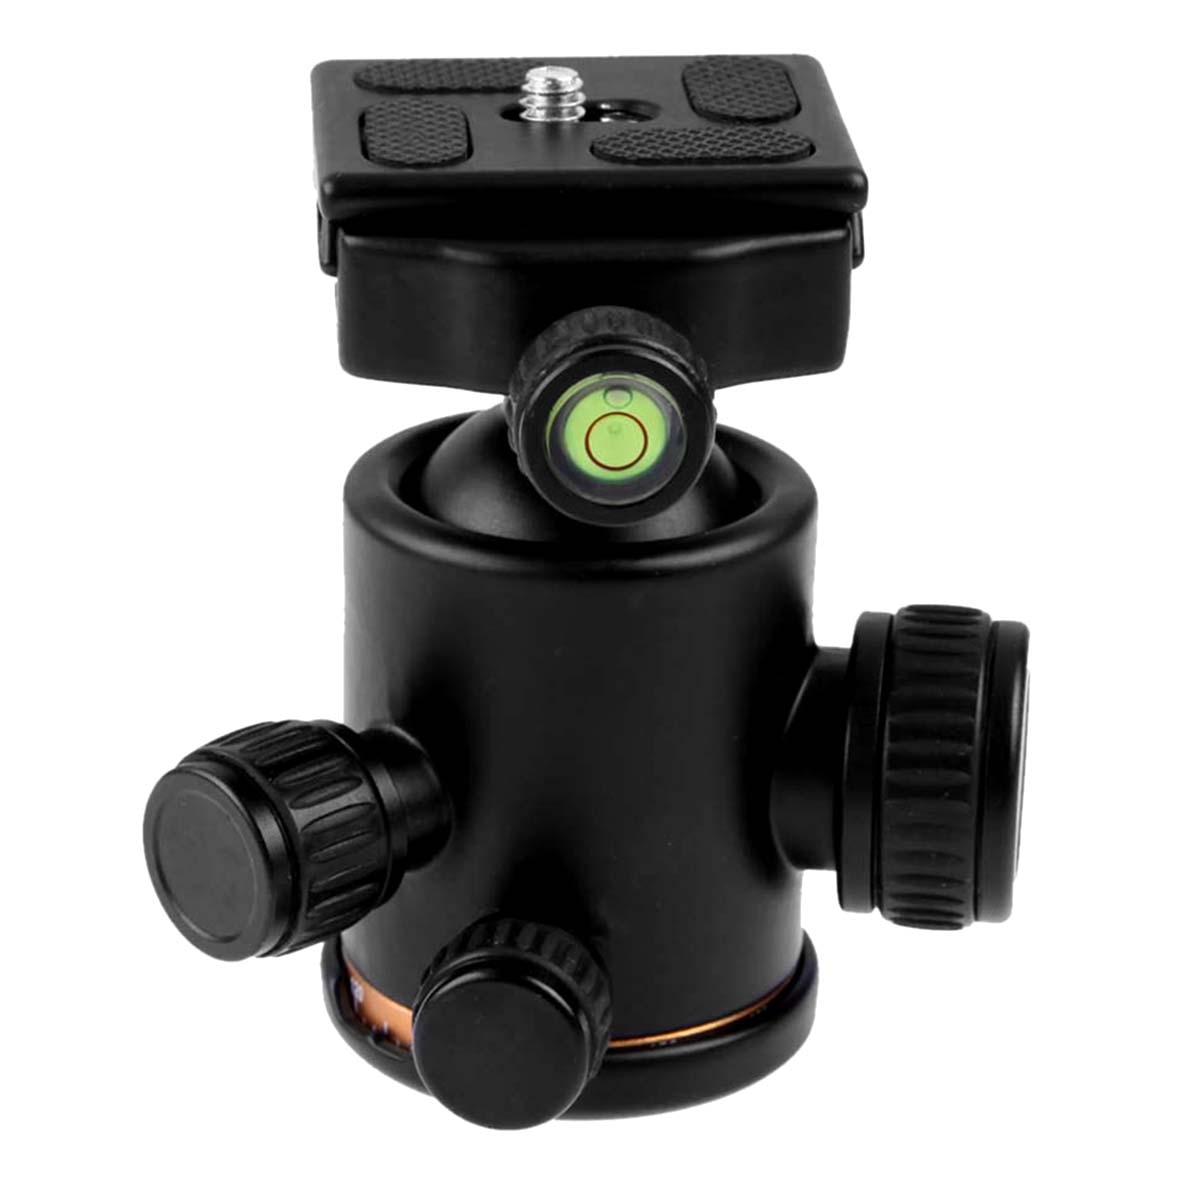 Cabezales de bola de trípode de cámara de rotación de fluido de cabeza de trípode con placa de liberación rápida para Canon MarkII III Rebel T6